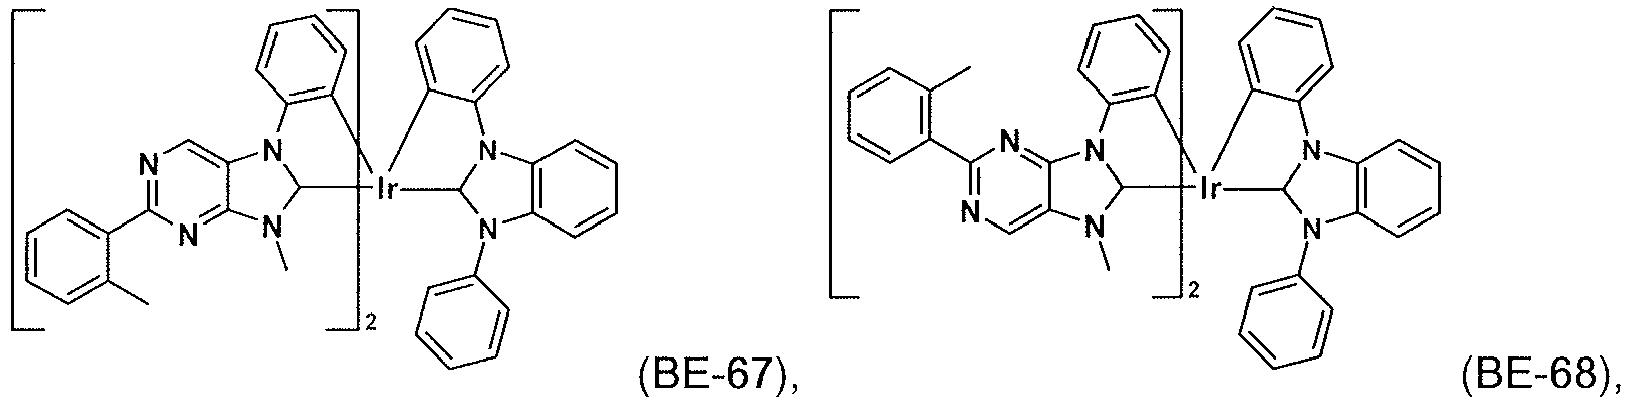 Figure imgb0621